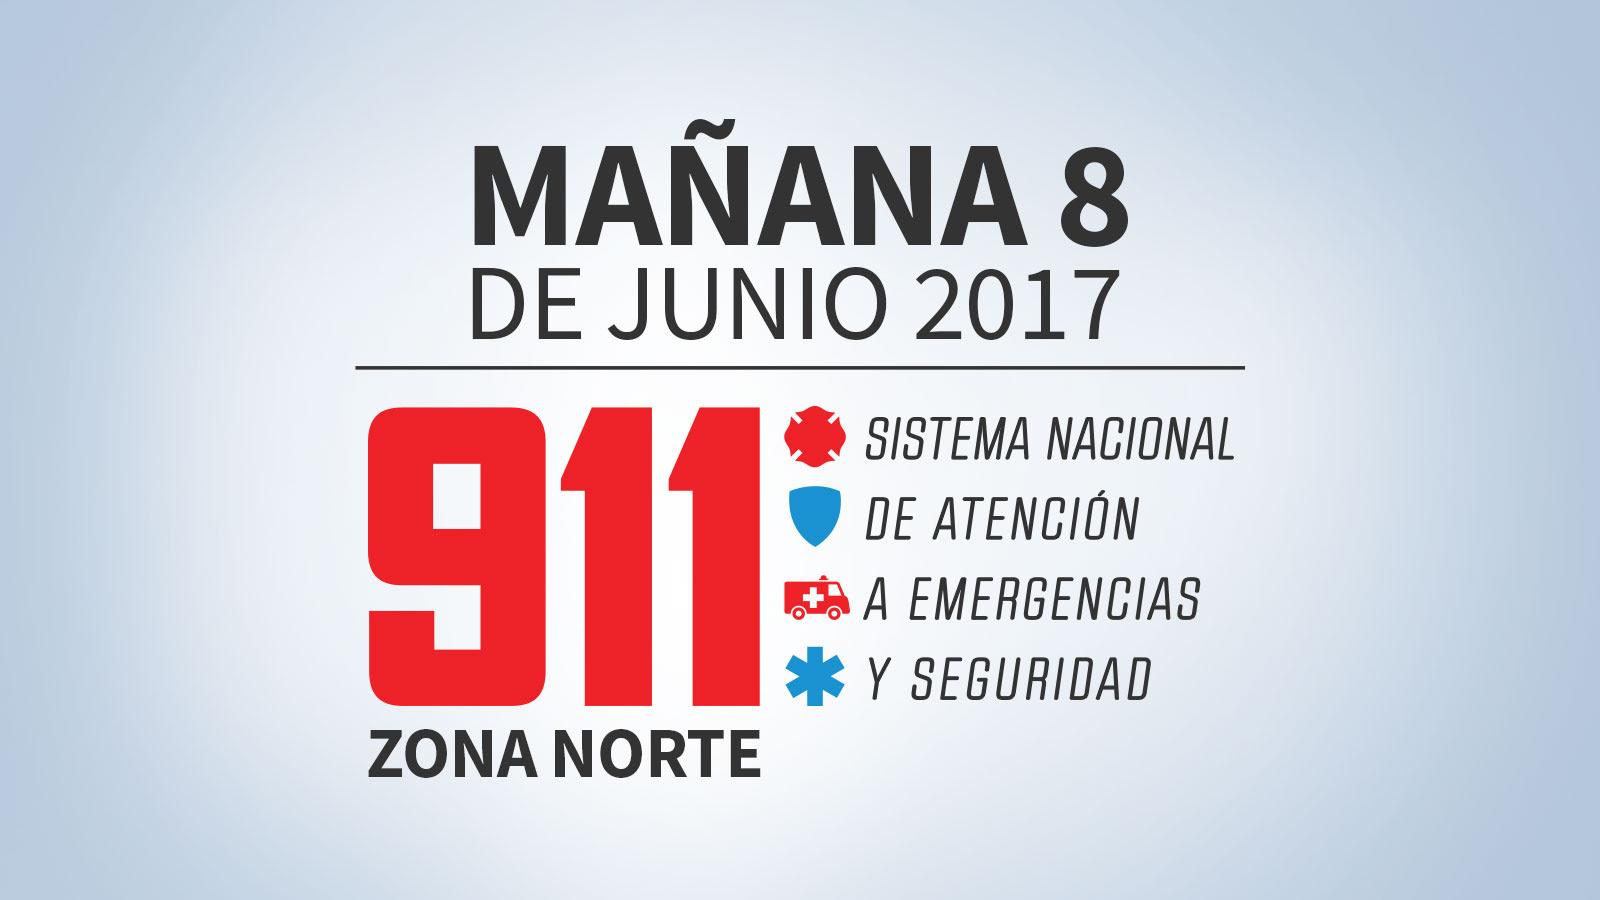 VIDEO: 911 Zona norte